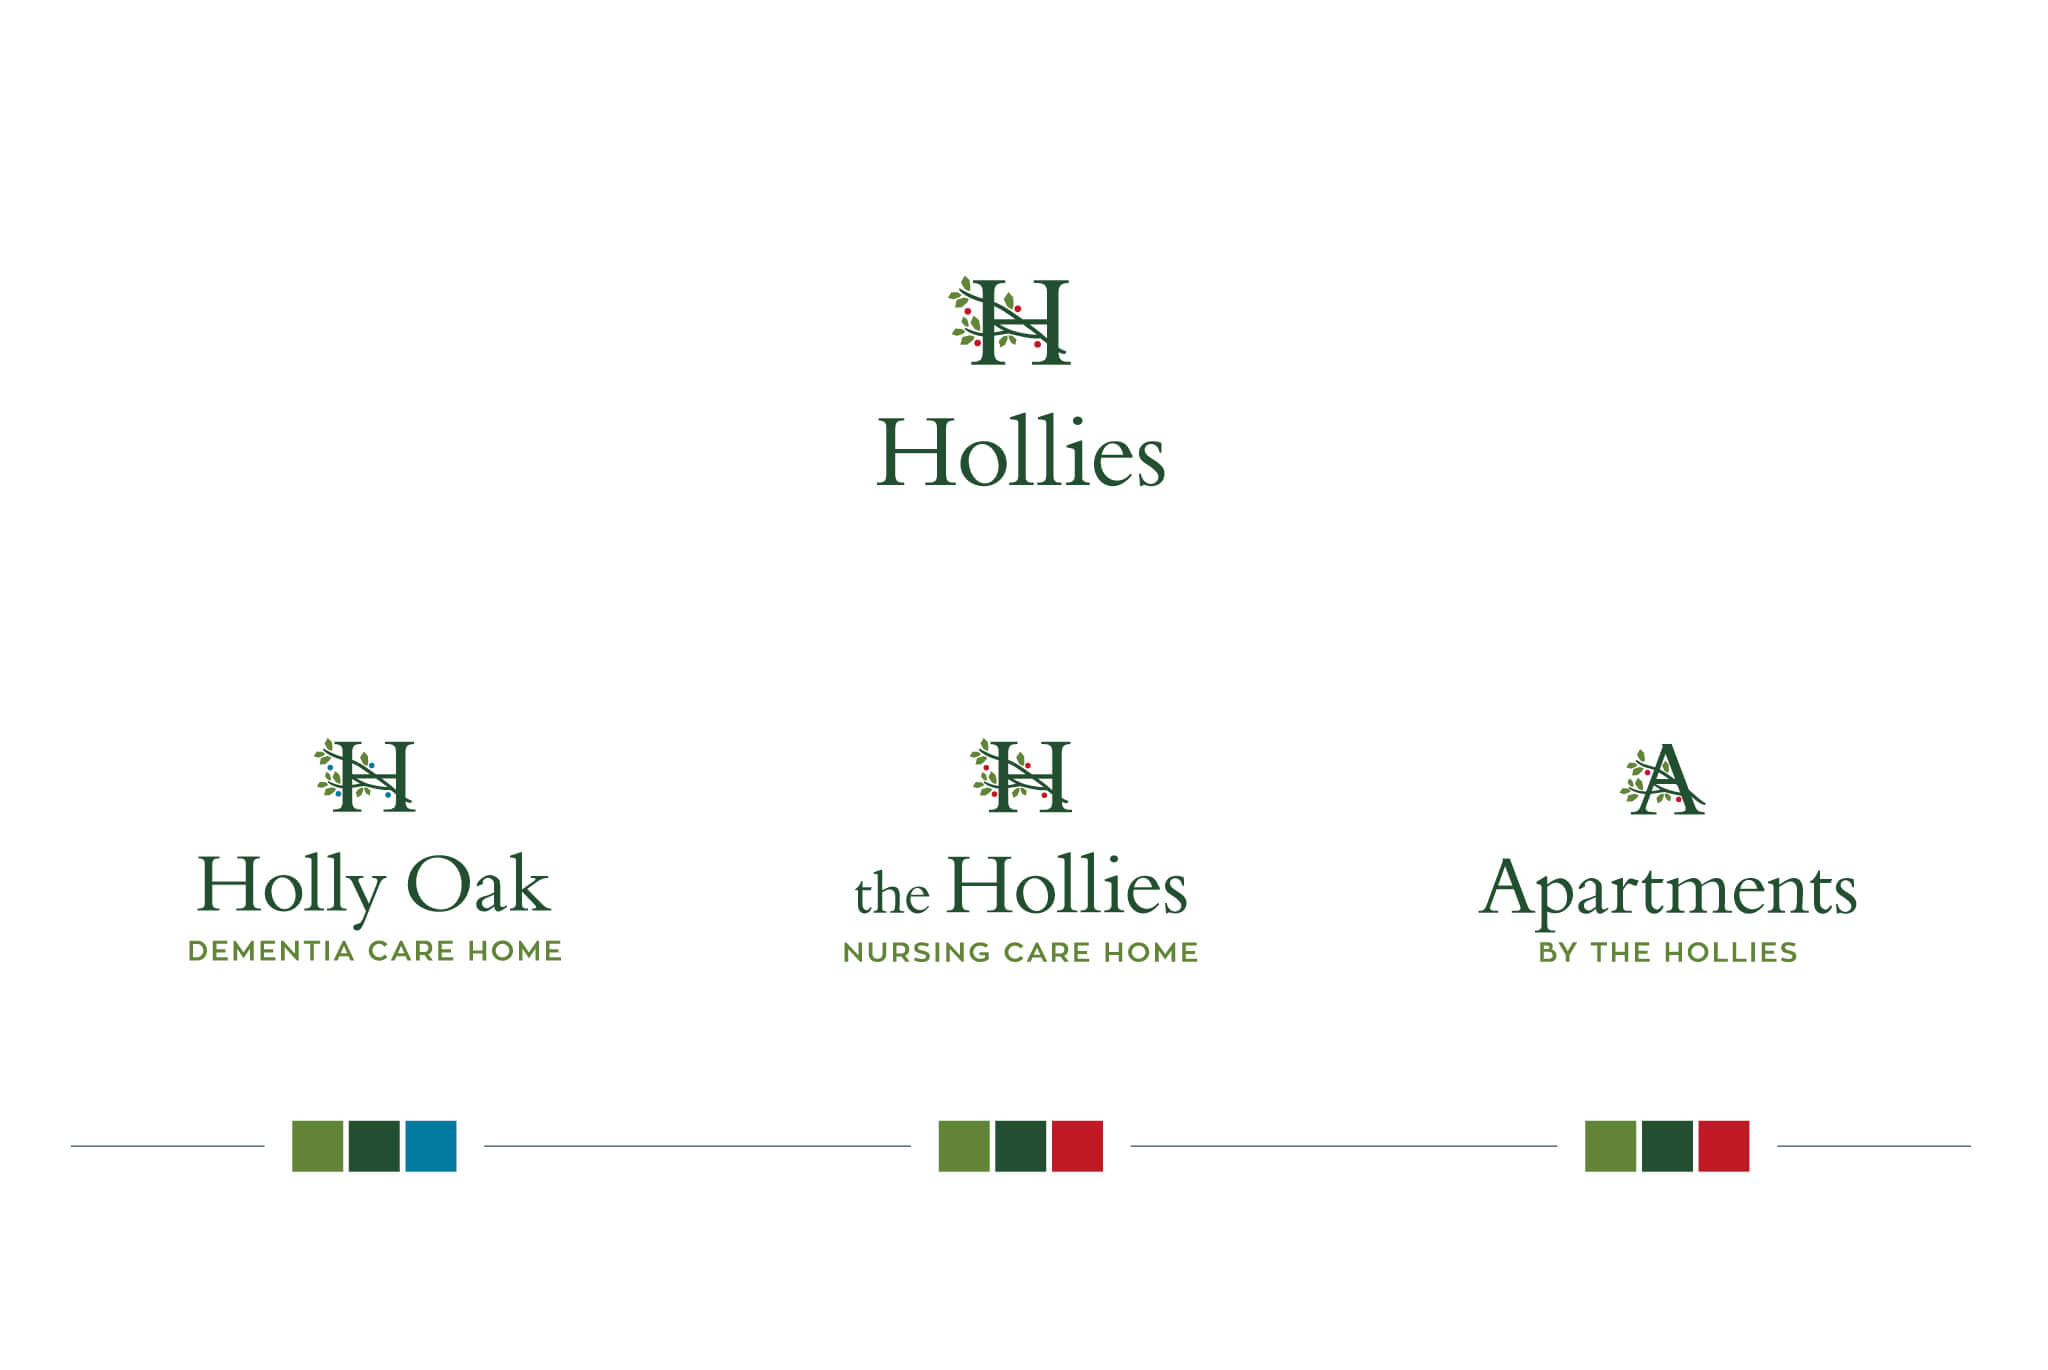 Hollies Branding